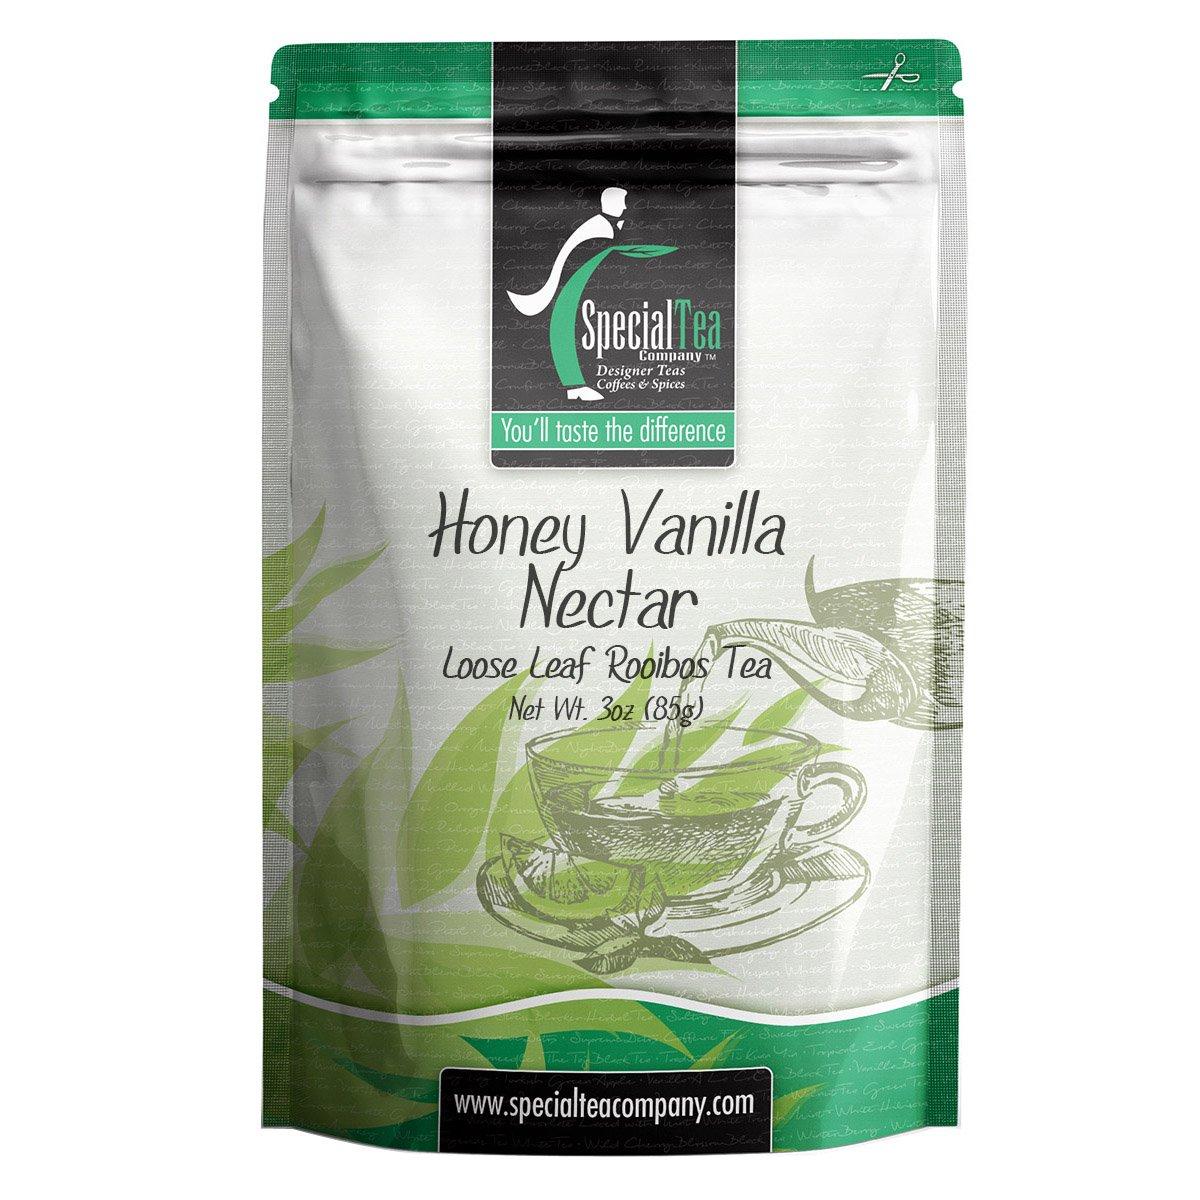 Special Tea Honey Vanilla Nectar Rooibos Tea, Loose Leaf, 3 Ounce